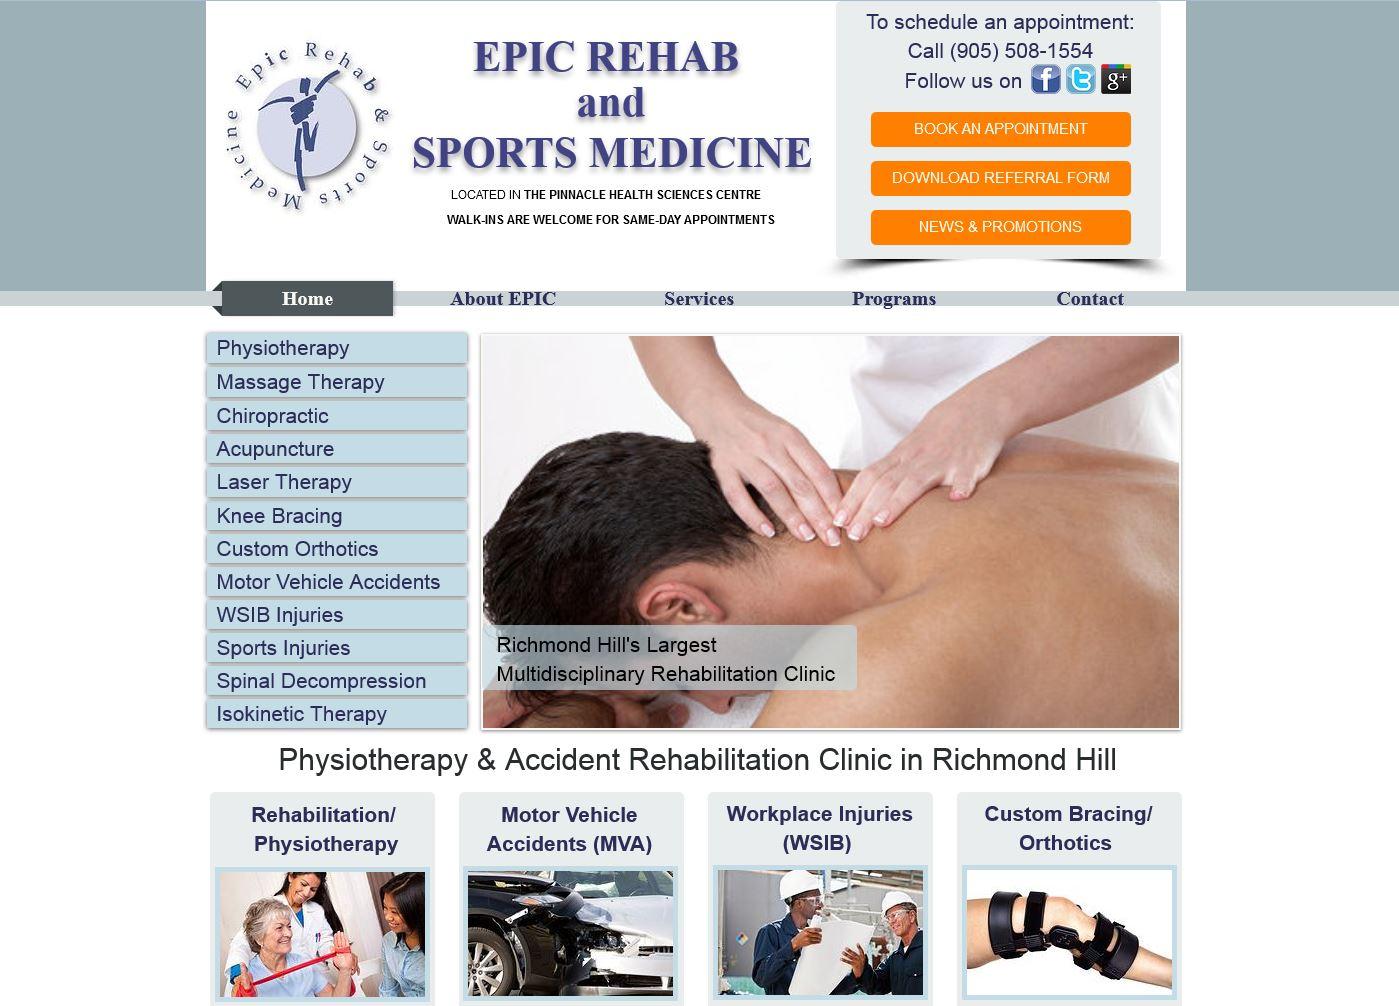 Epic Rehab and Sports Medicine